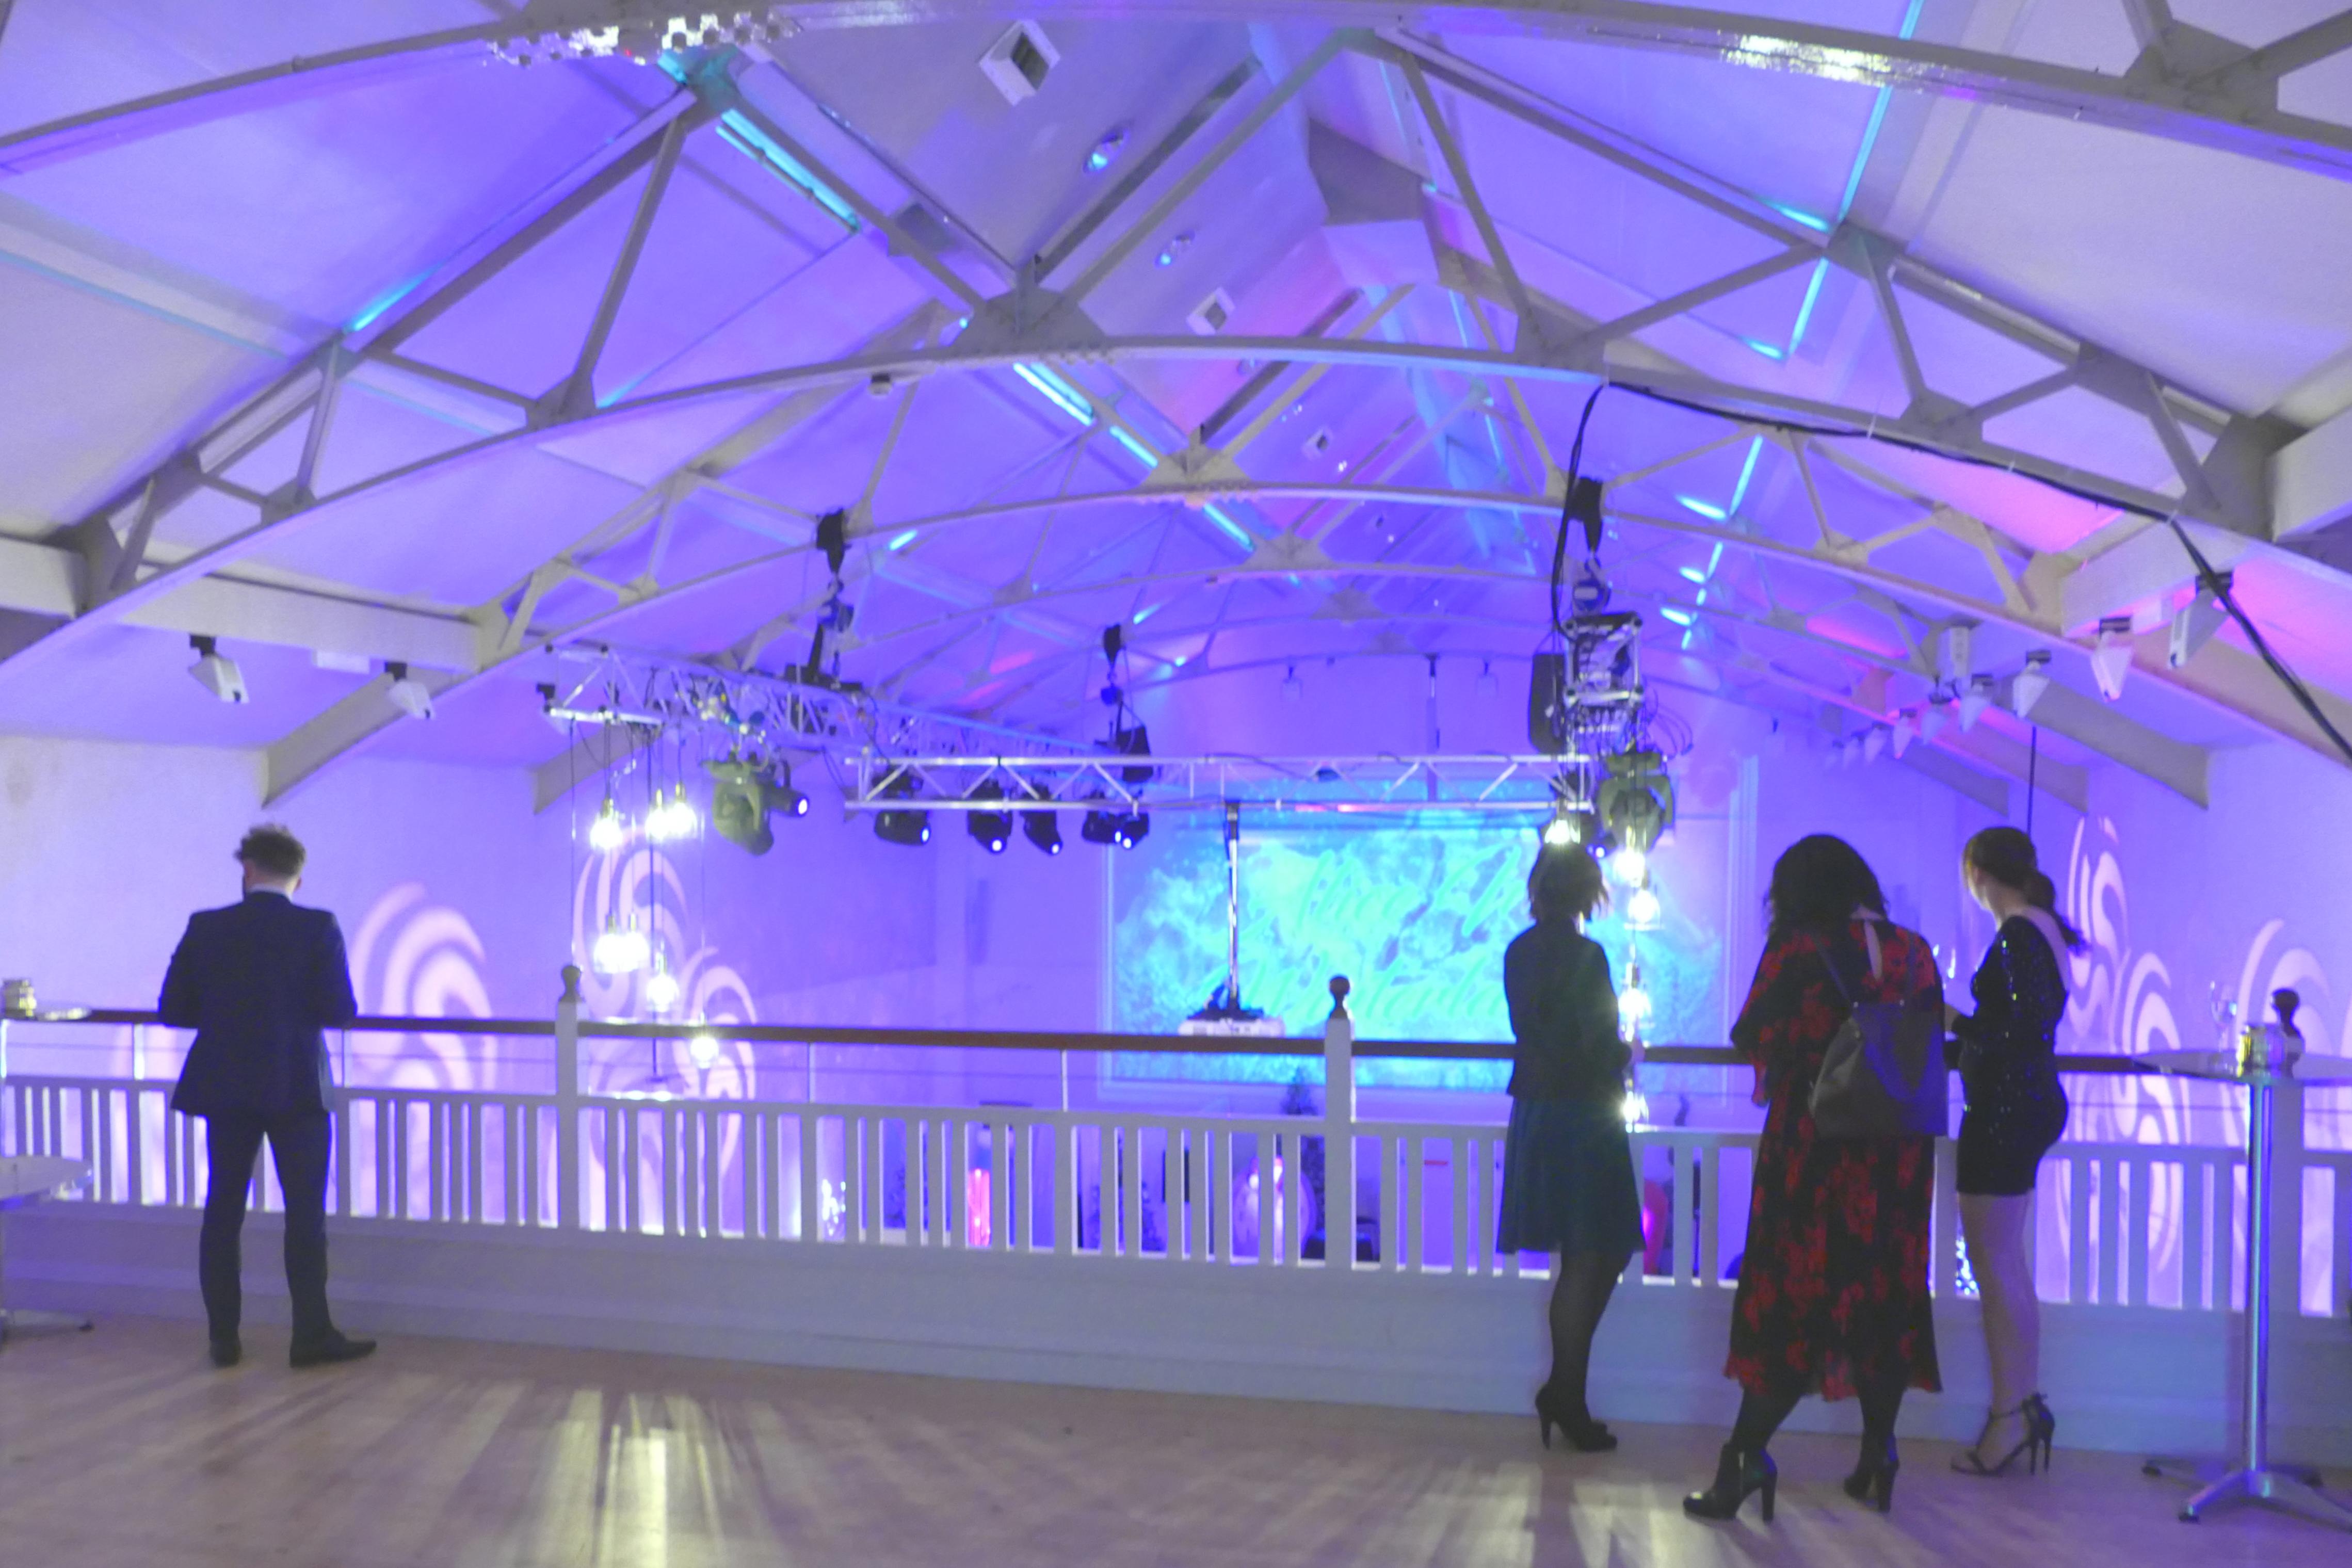 hellenic centre blank canvas venue london